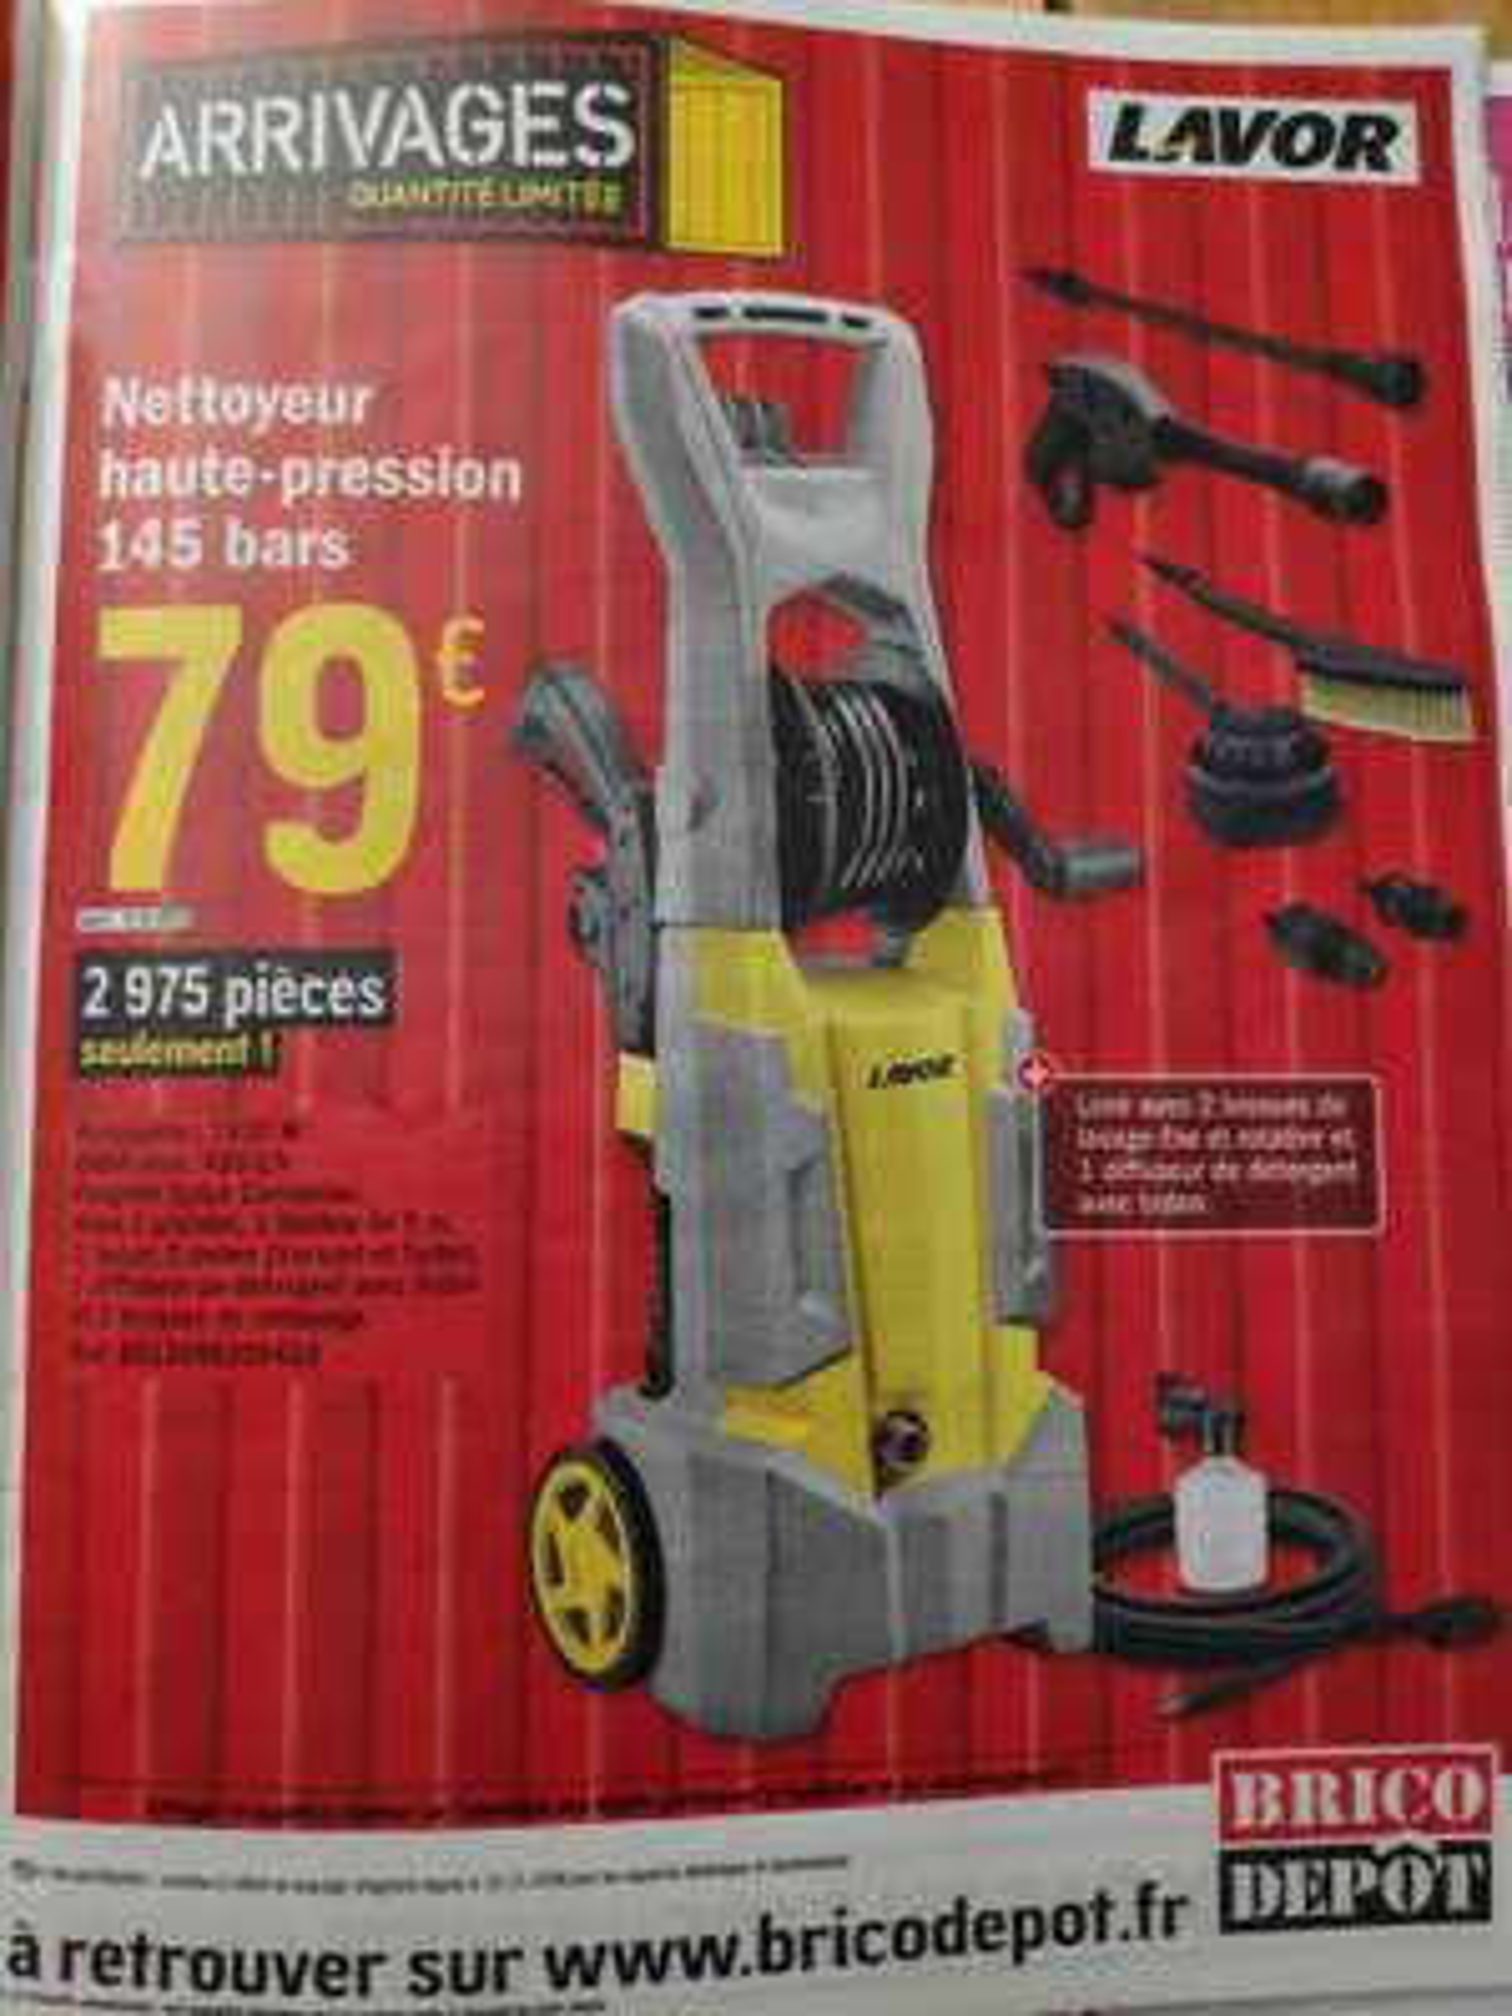 Nettoyeur Haute Pression Lavor - 145 Bars